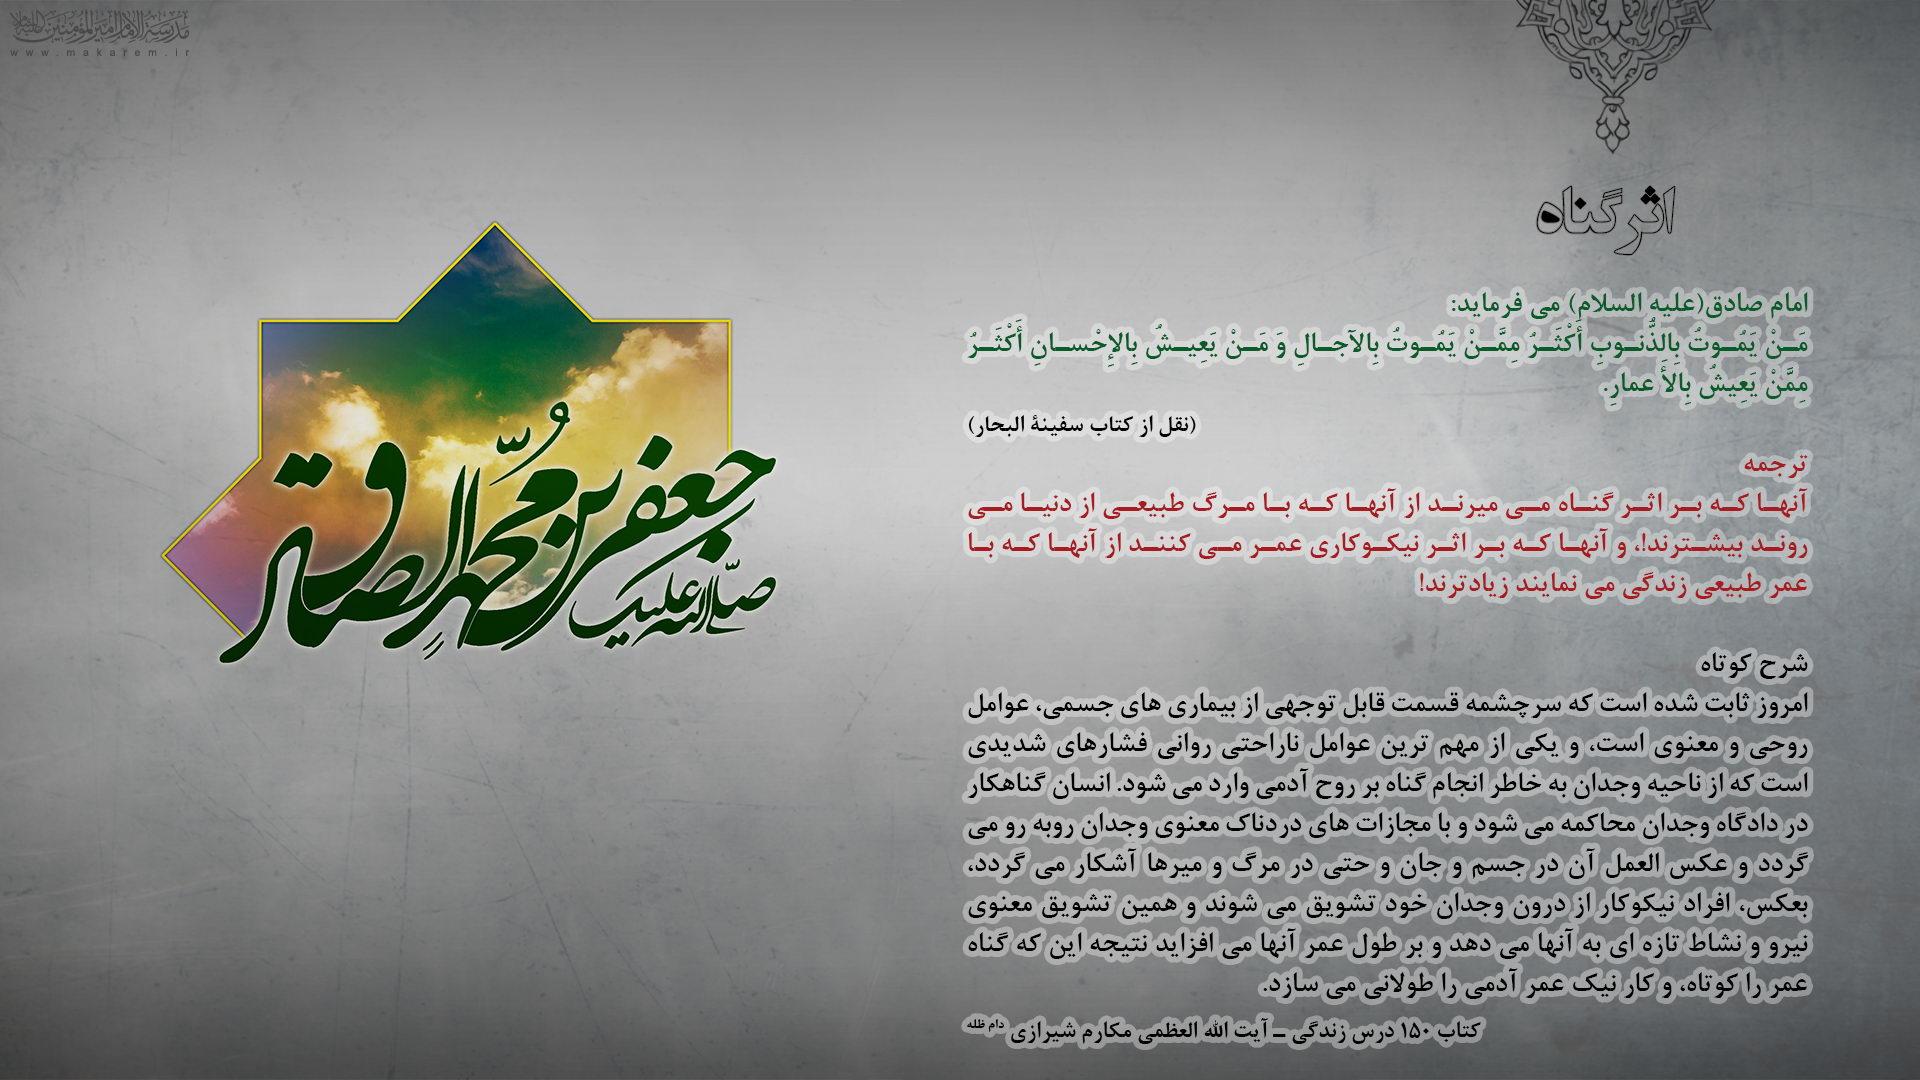 اثر گناه-مدرسه الامام امیر المومنین (ع)